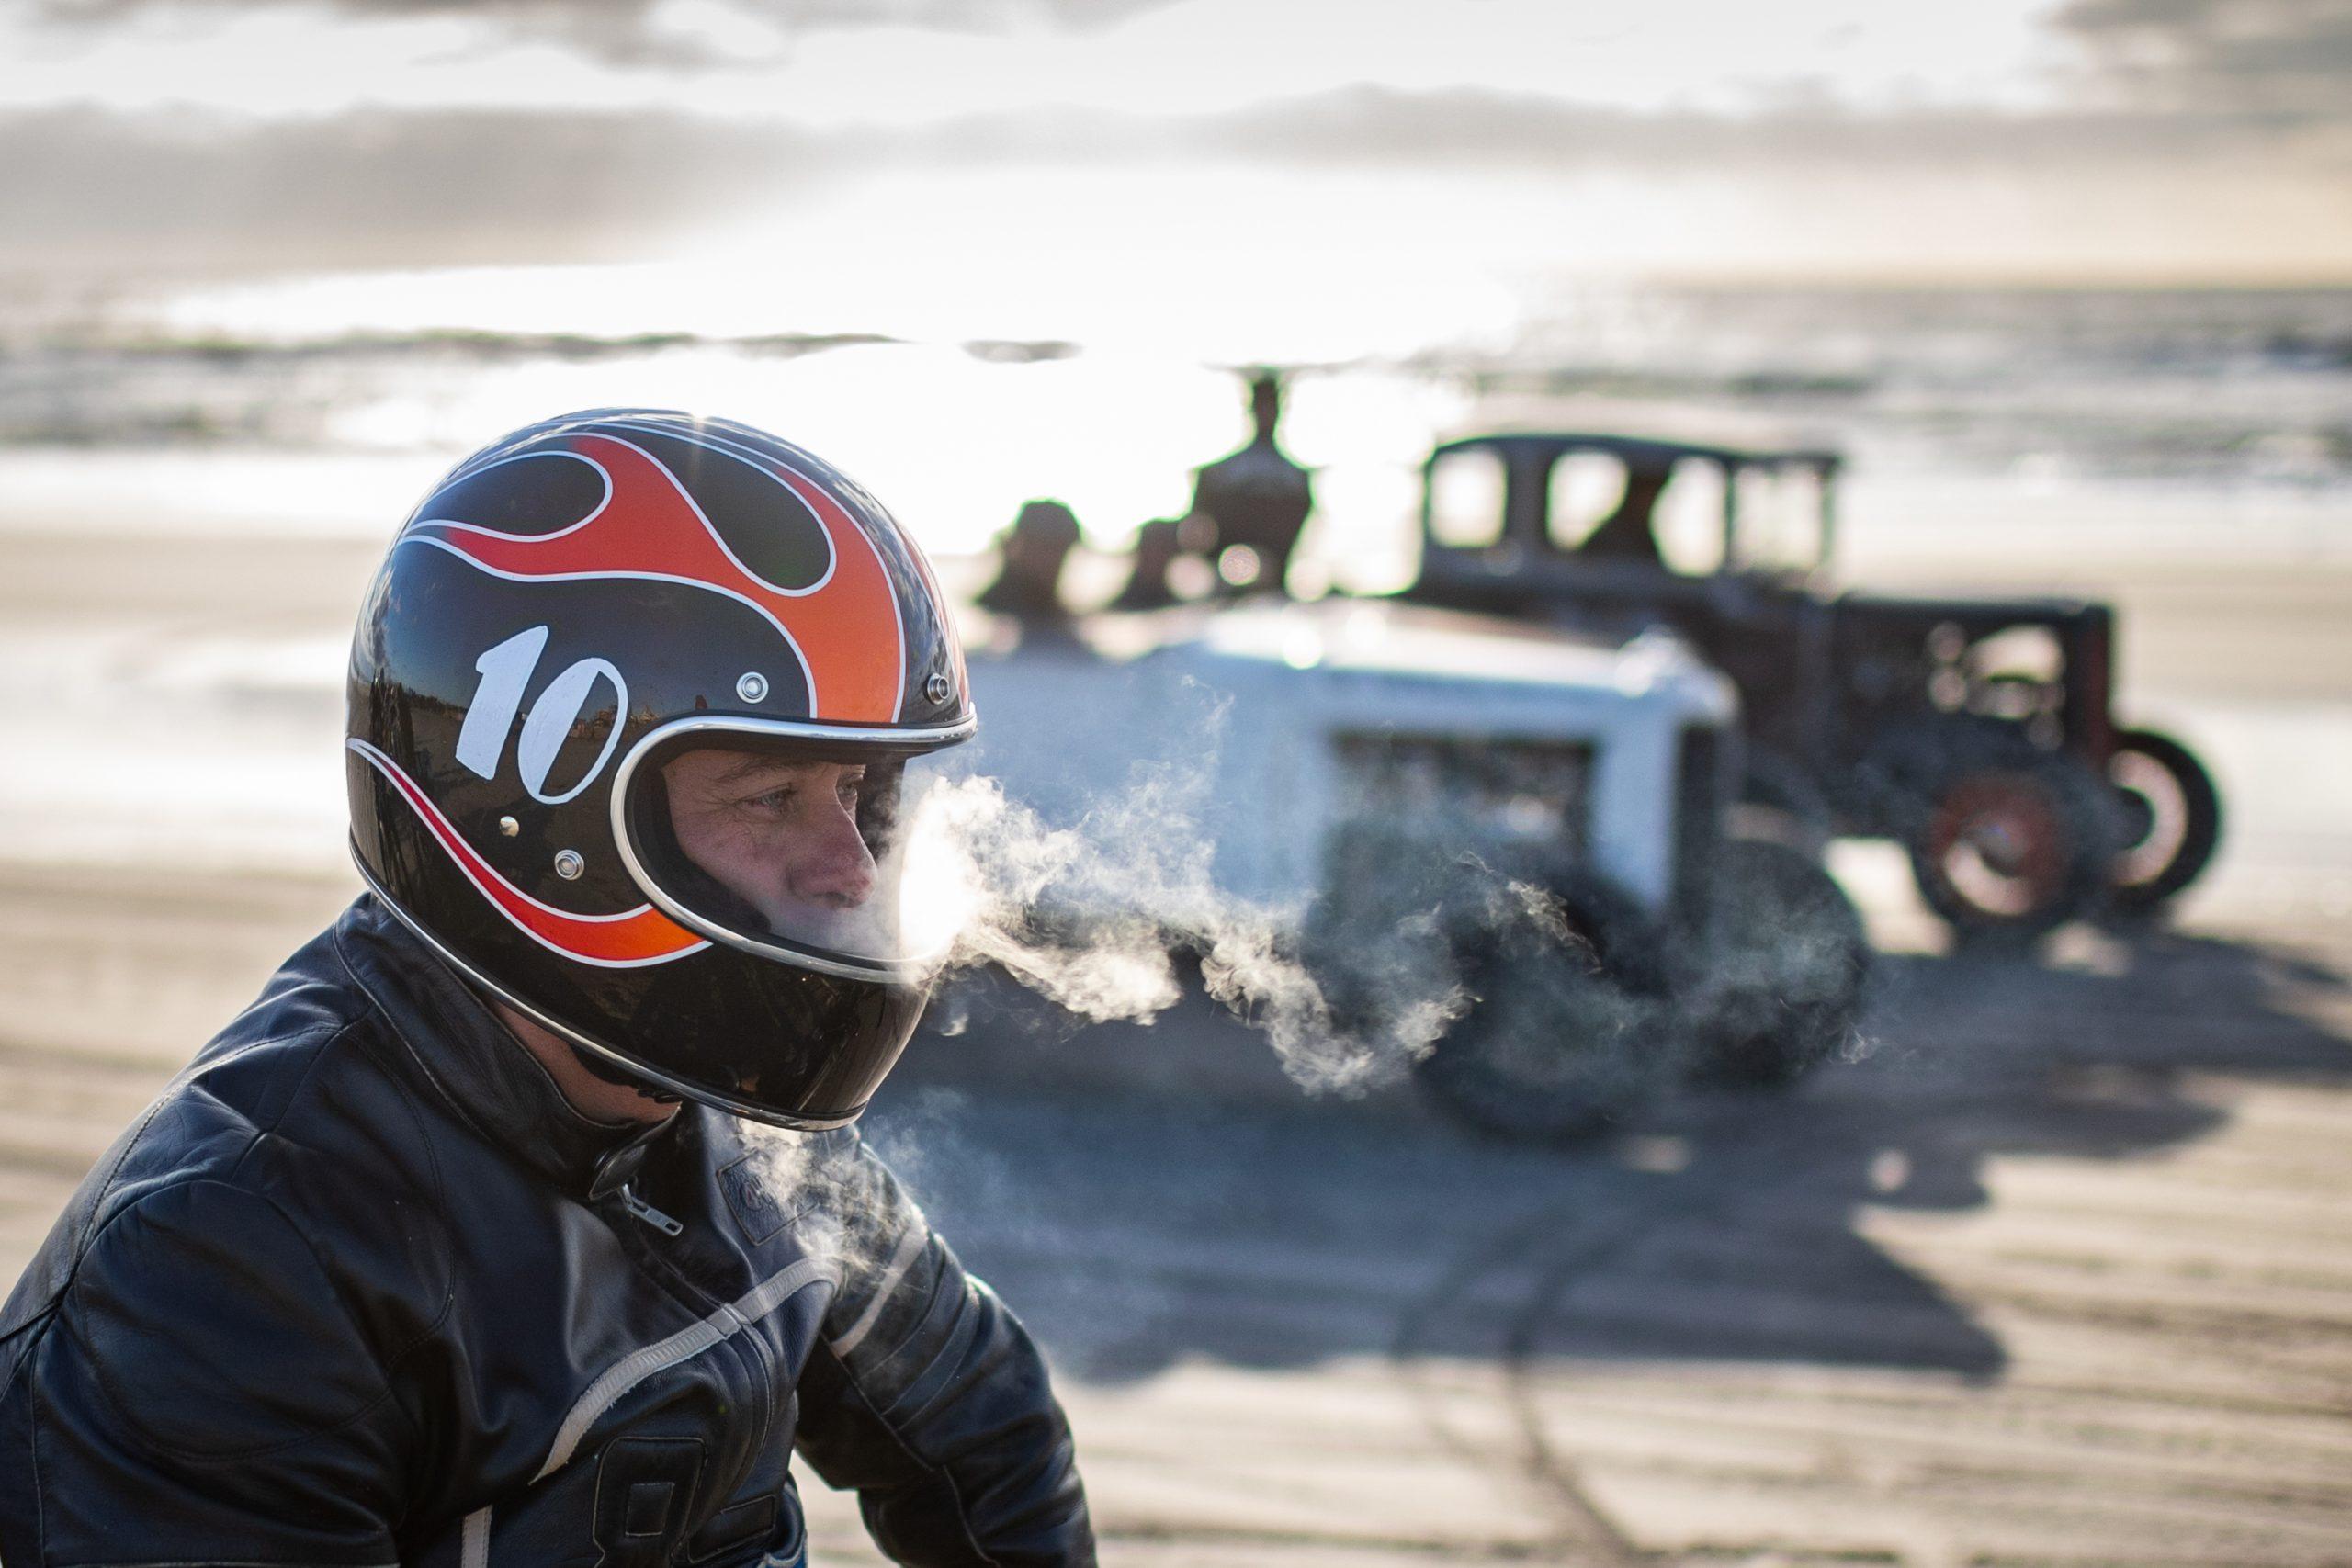 motorbike beach drag racing